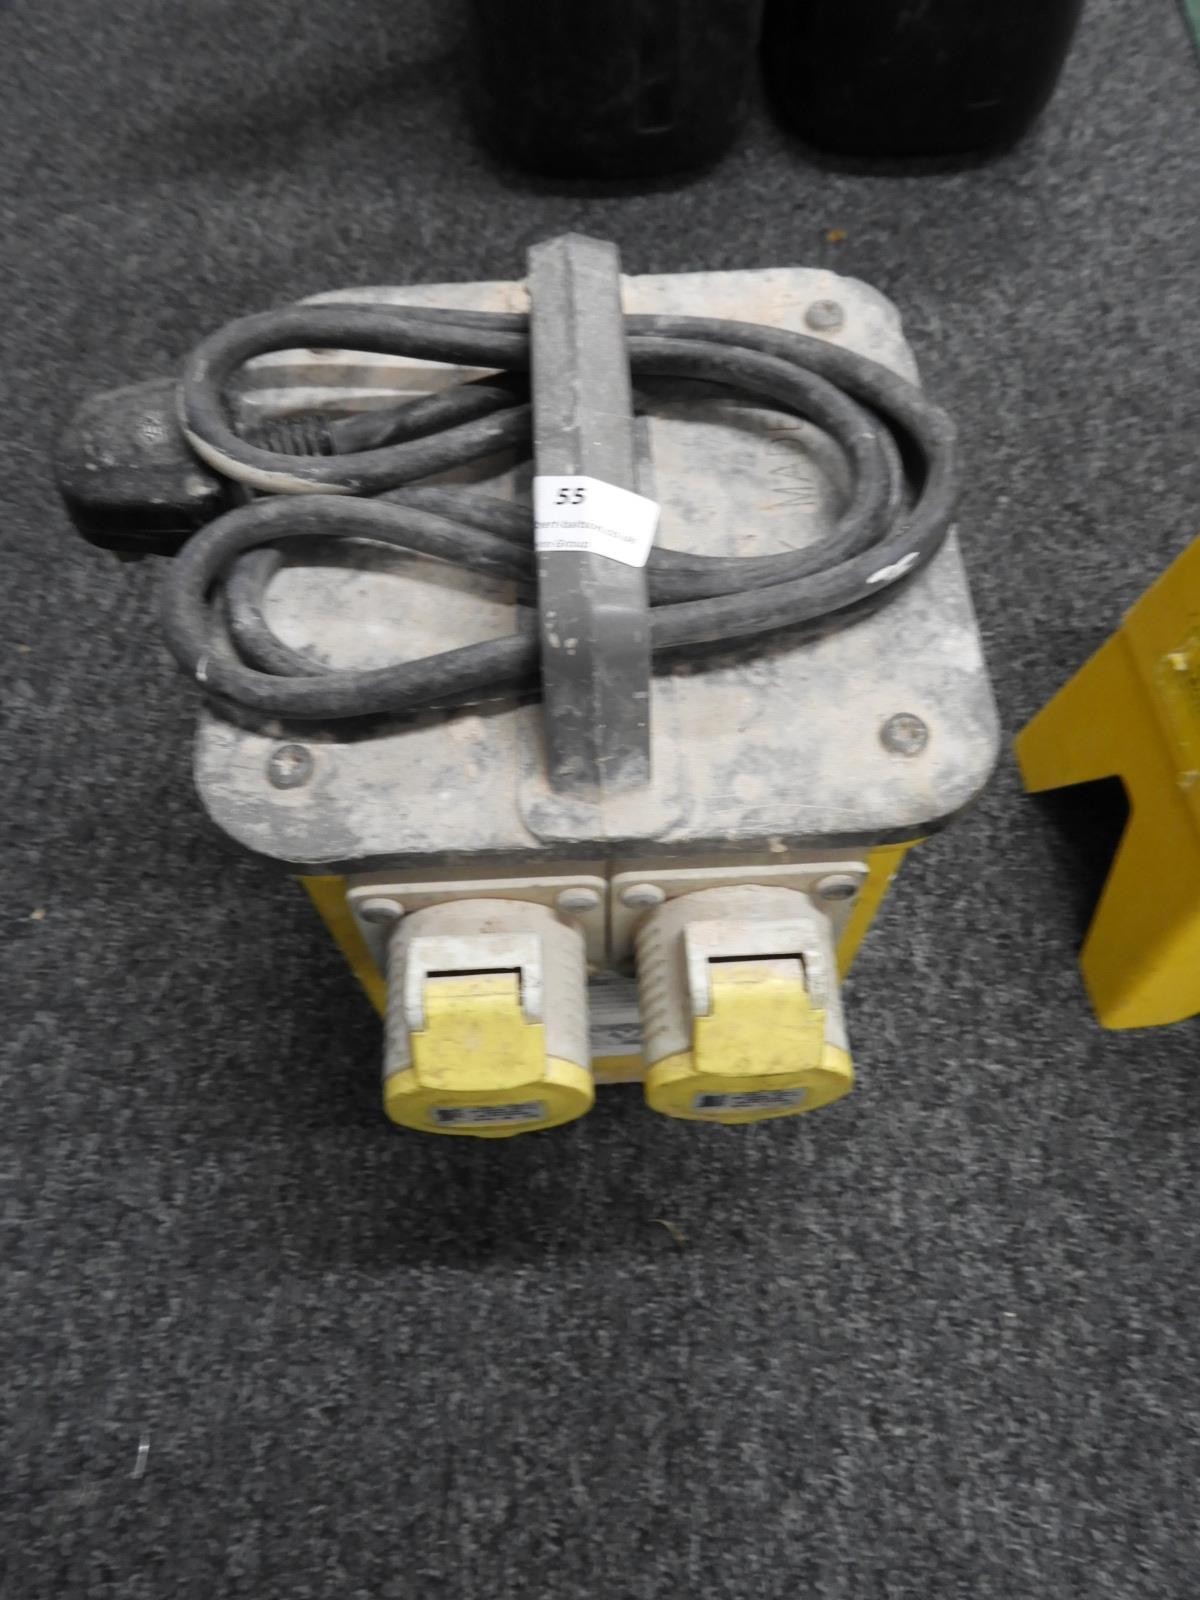 Lot 55 - *110V 3.3KvA Two Tool Transformer